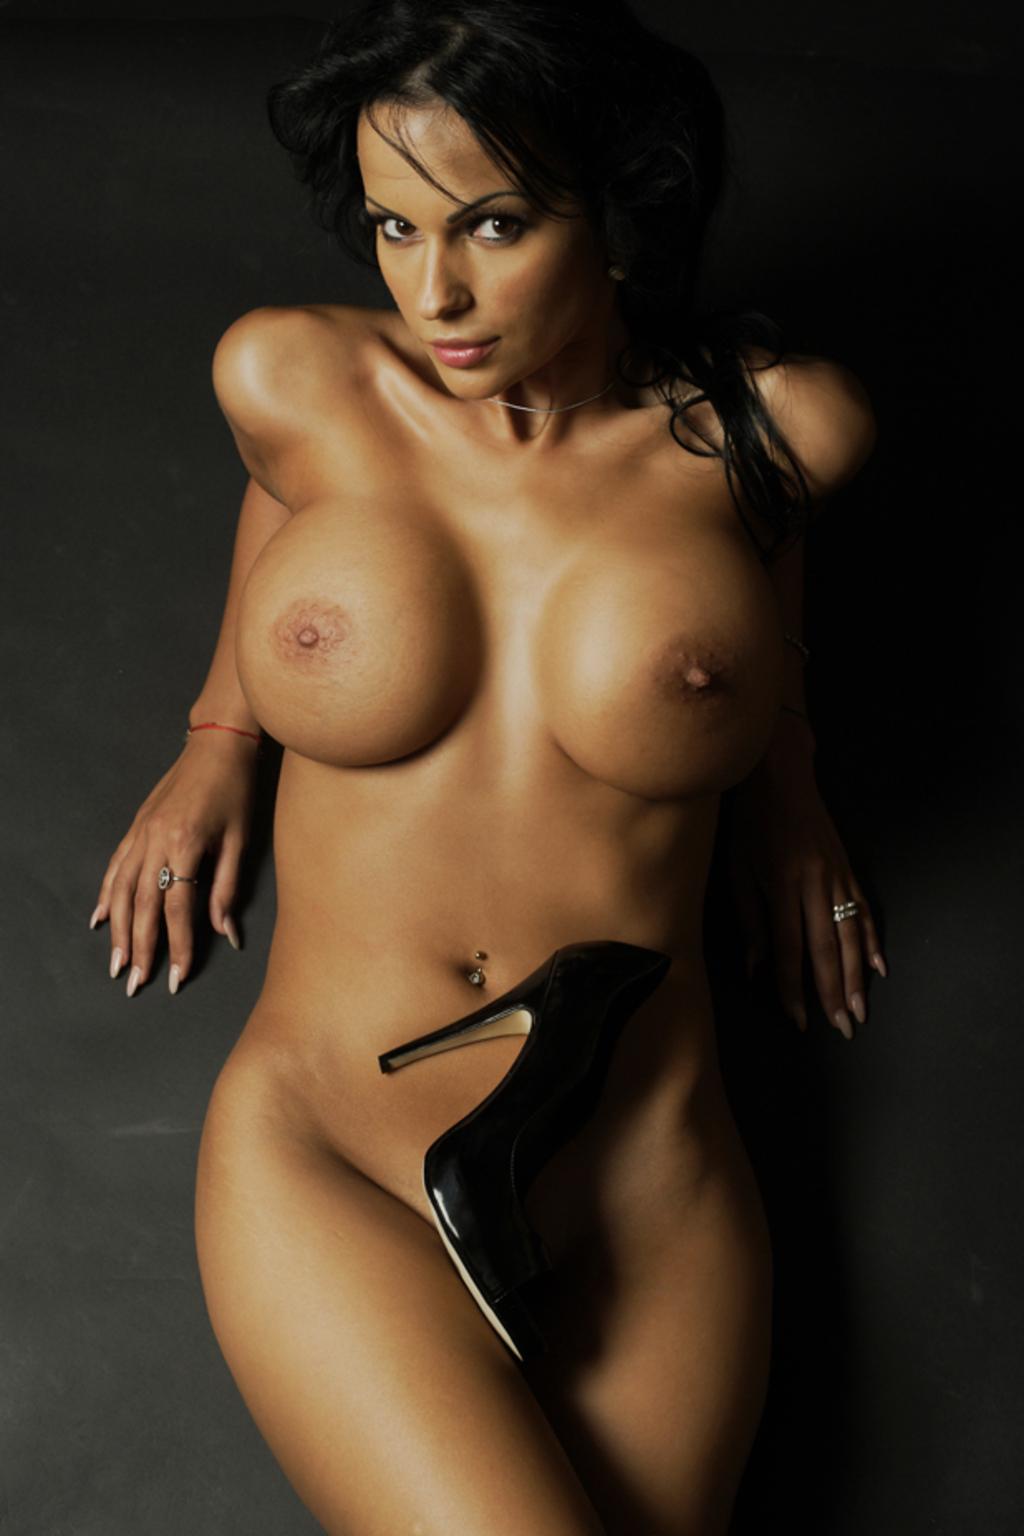 Фото груди 2го размера фото 11 фотография